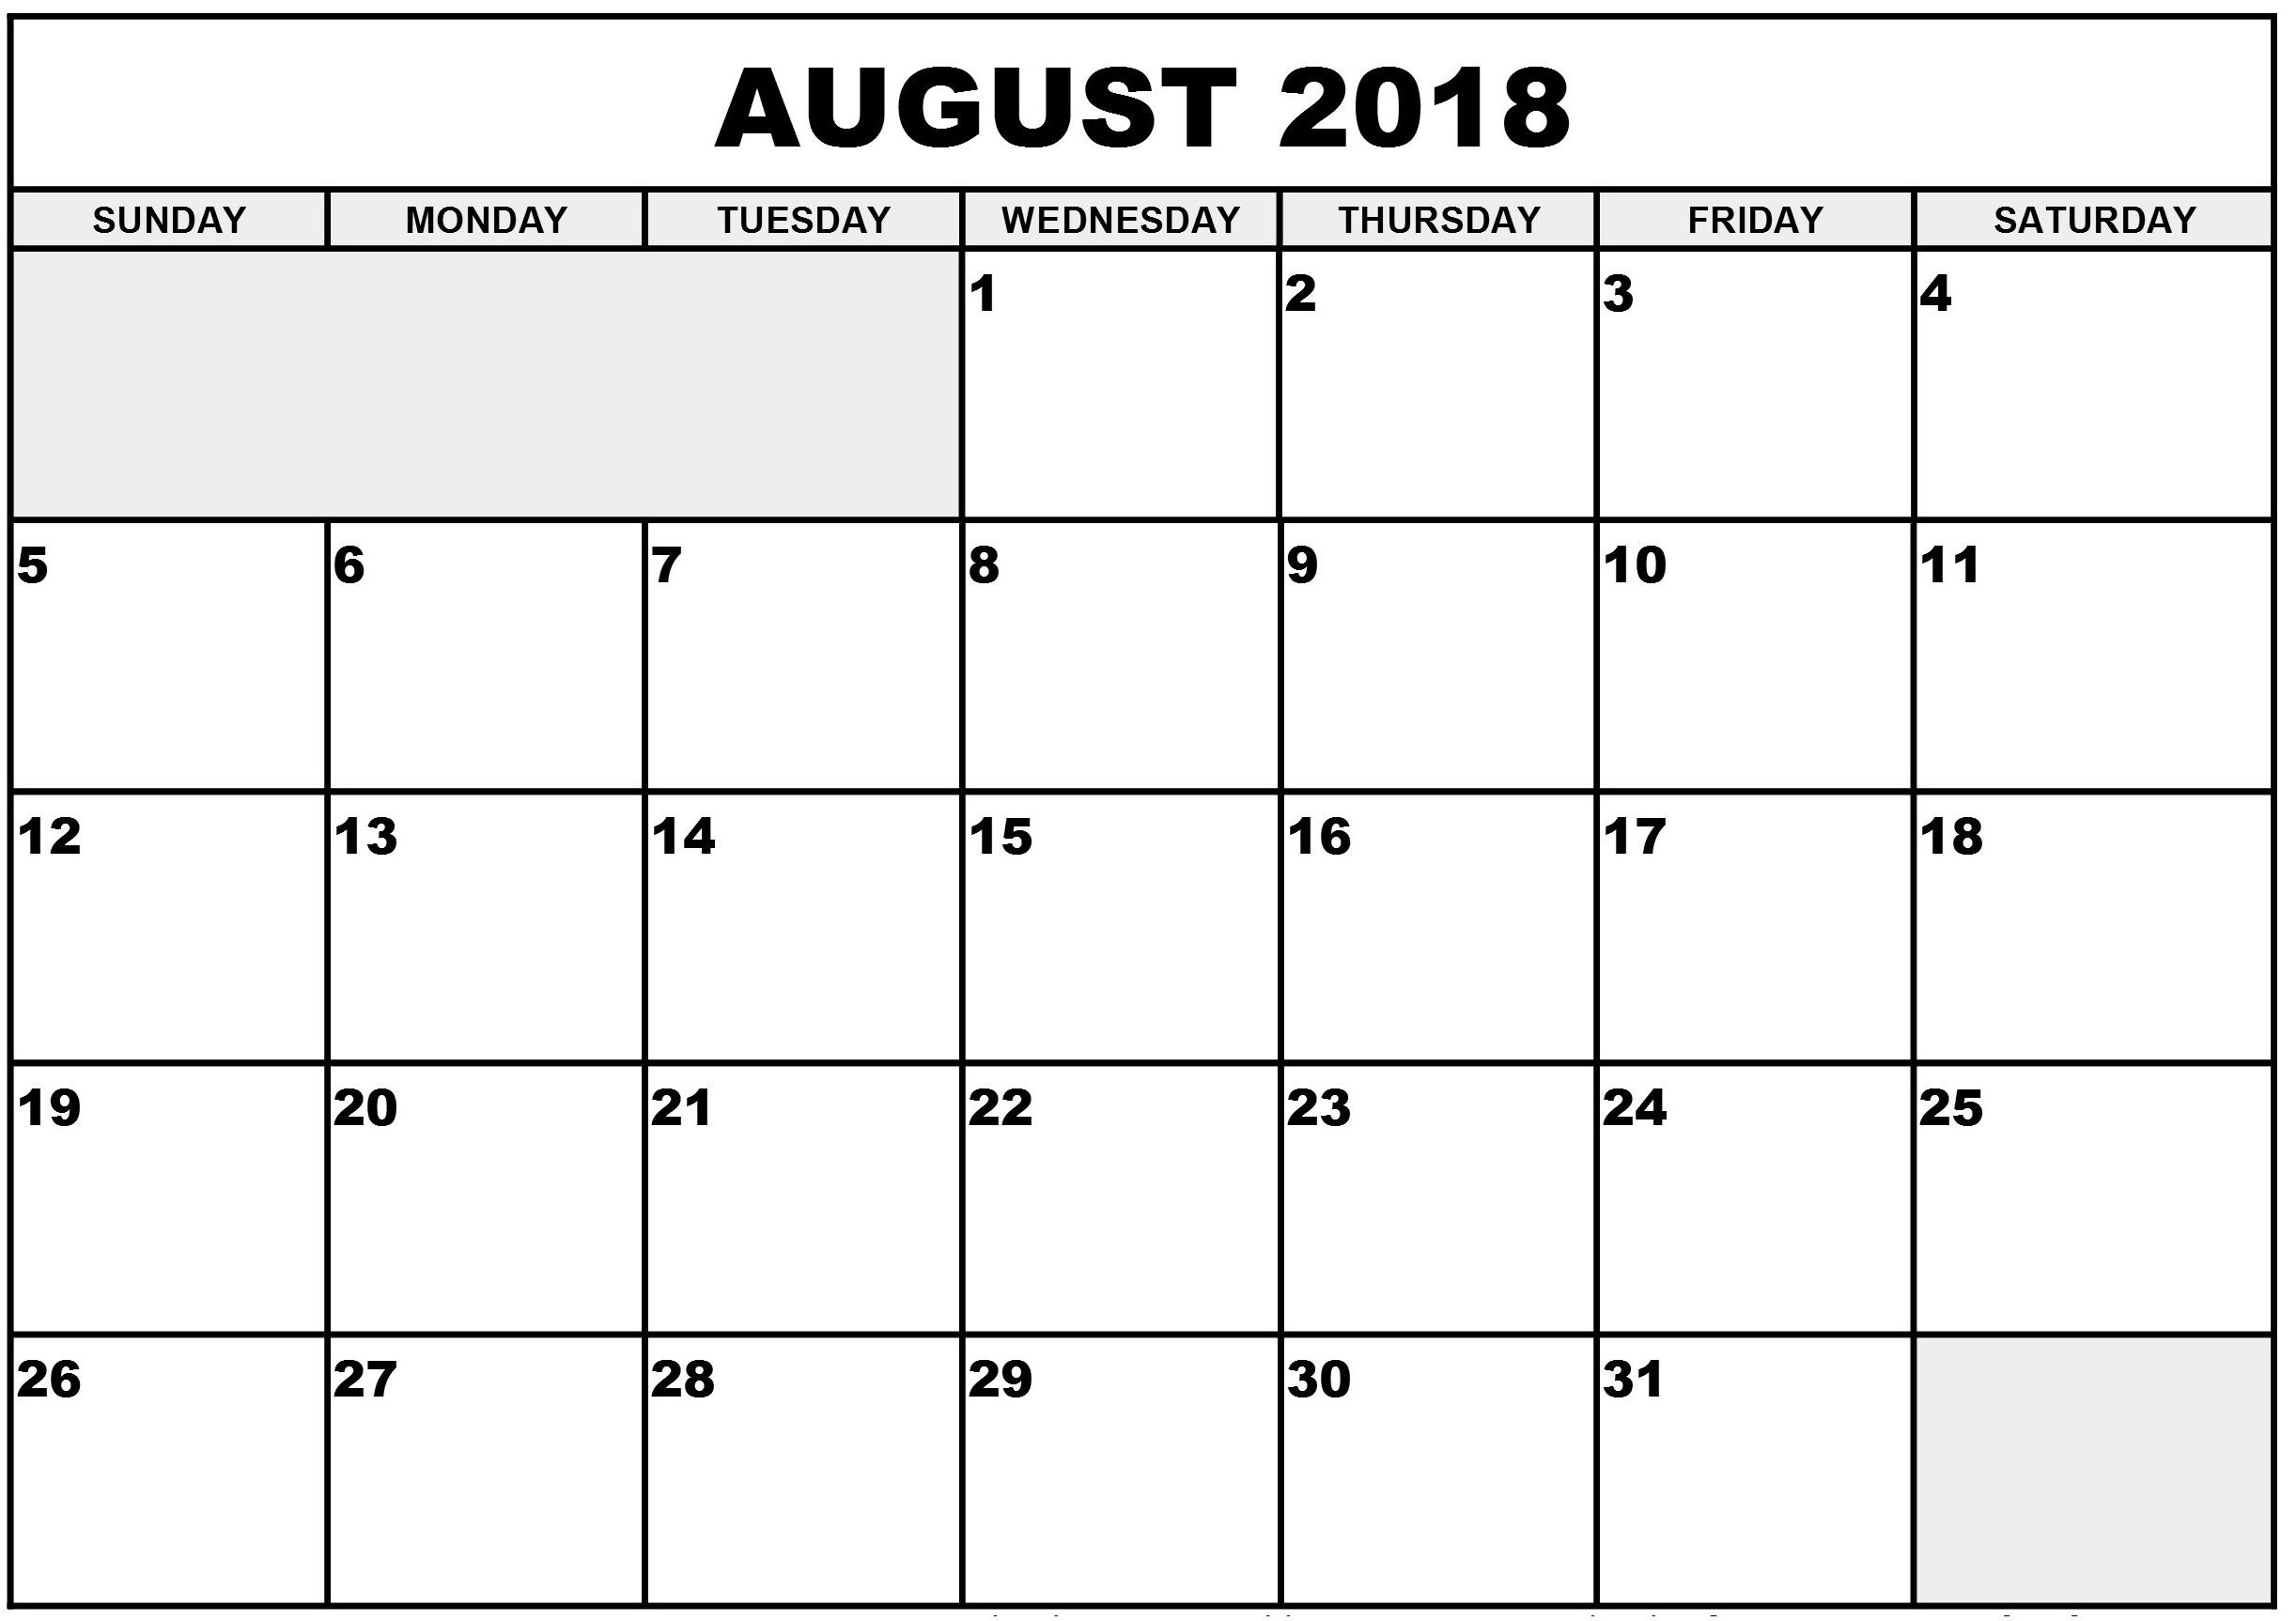 daily calendar 2018 printable template word excel pdf store Calendar August 2018 Uk List erdferdf